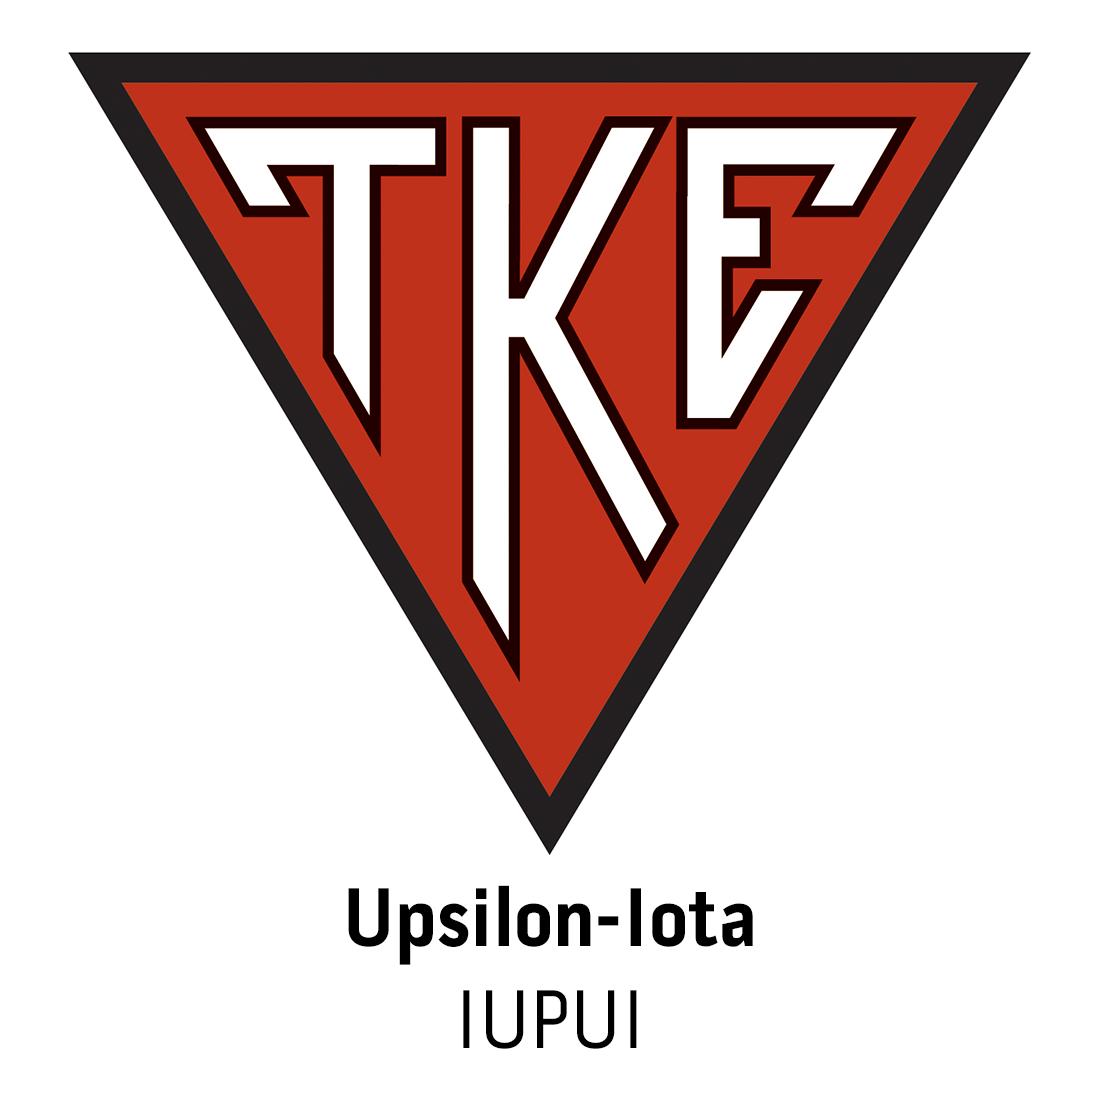 Upsilon-Iota Chapter at Indiana University-Purdue University Indianapolis